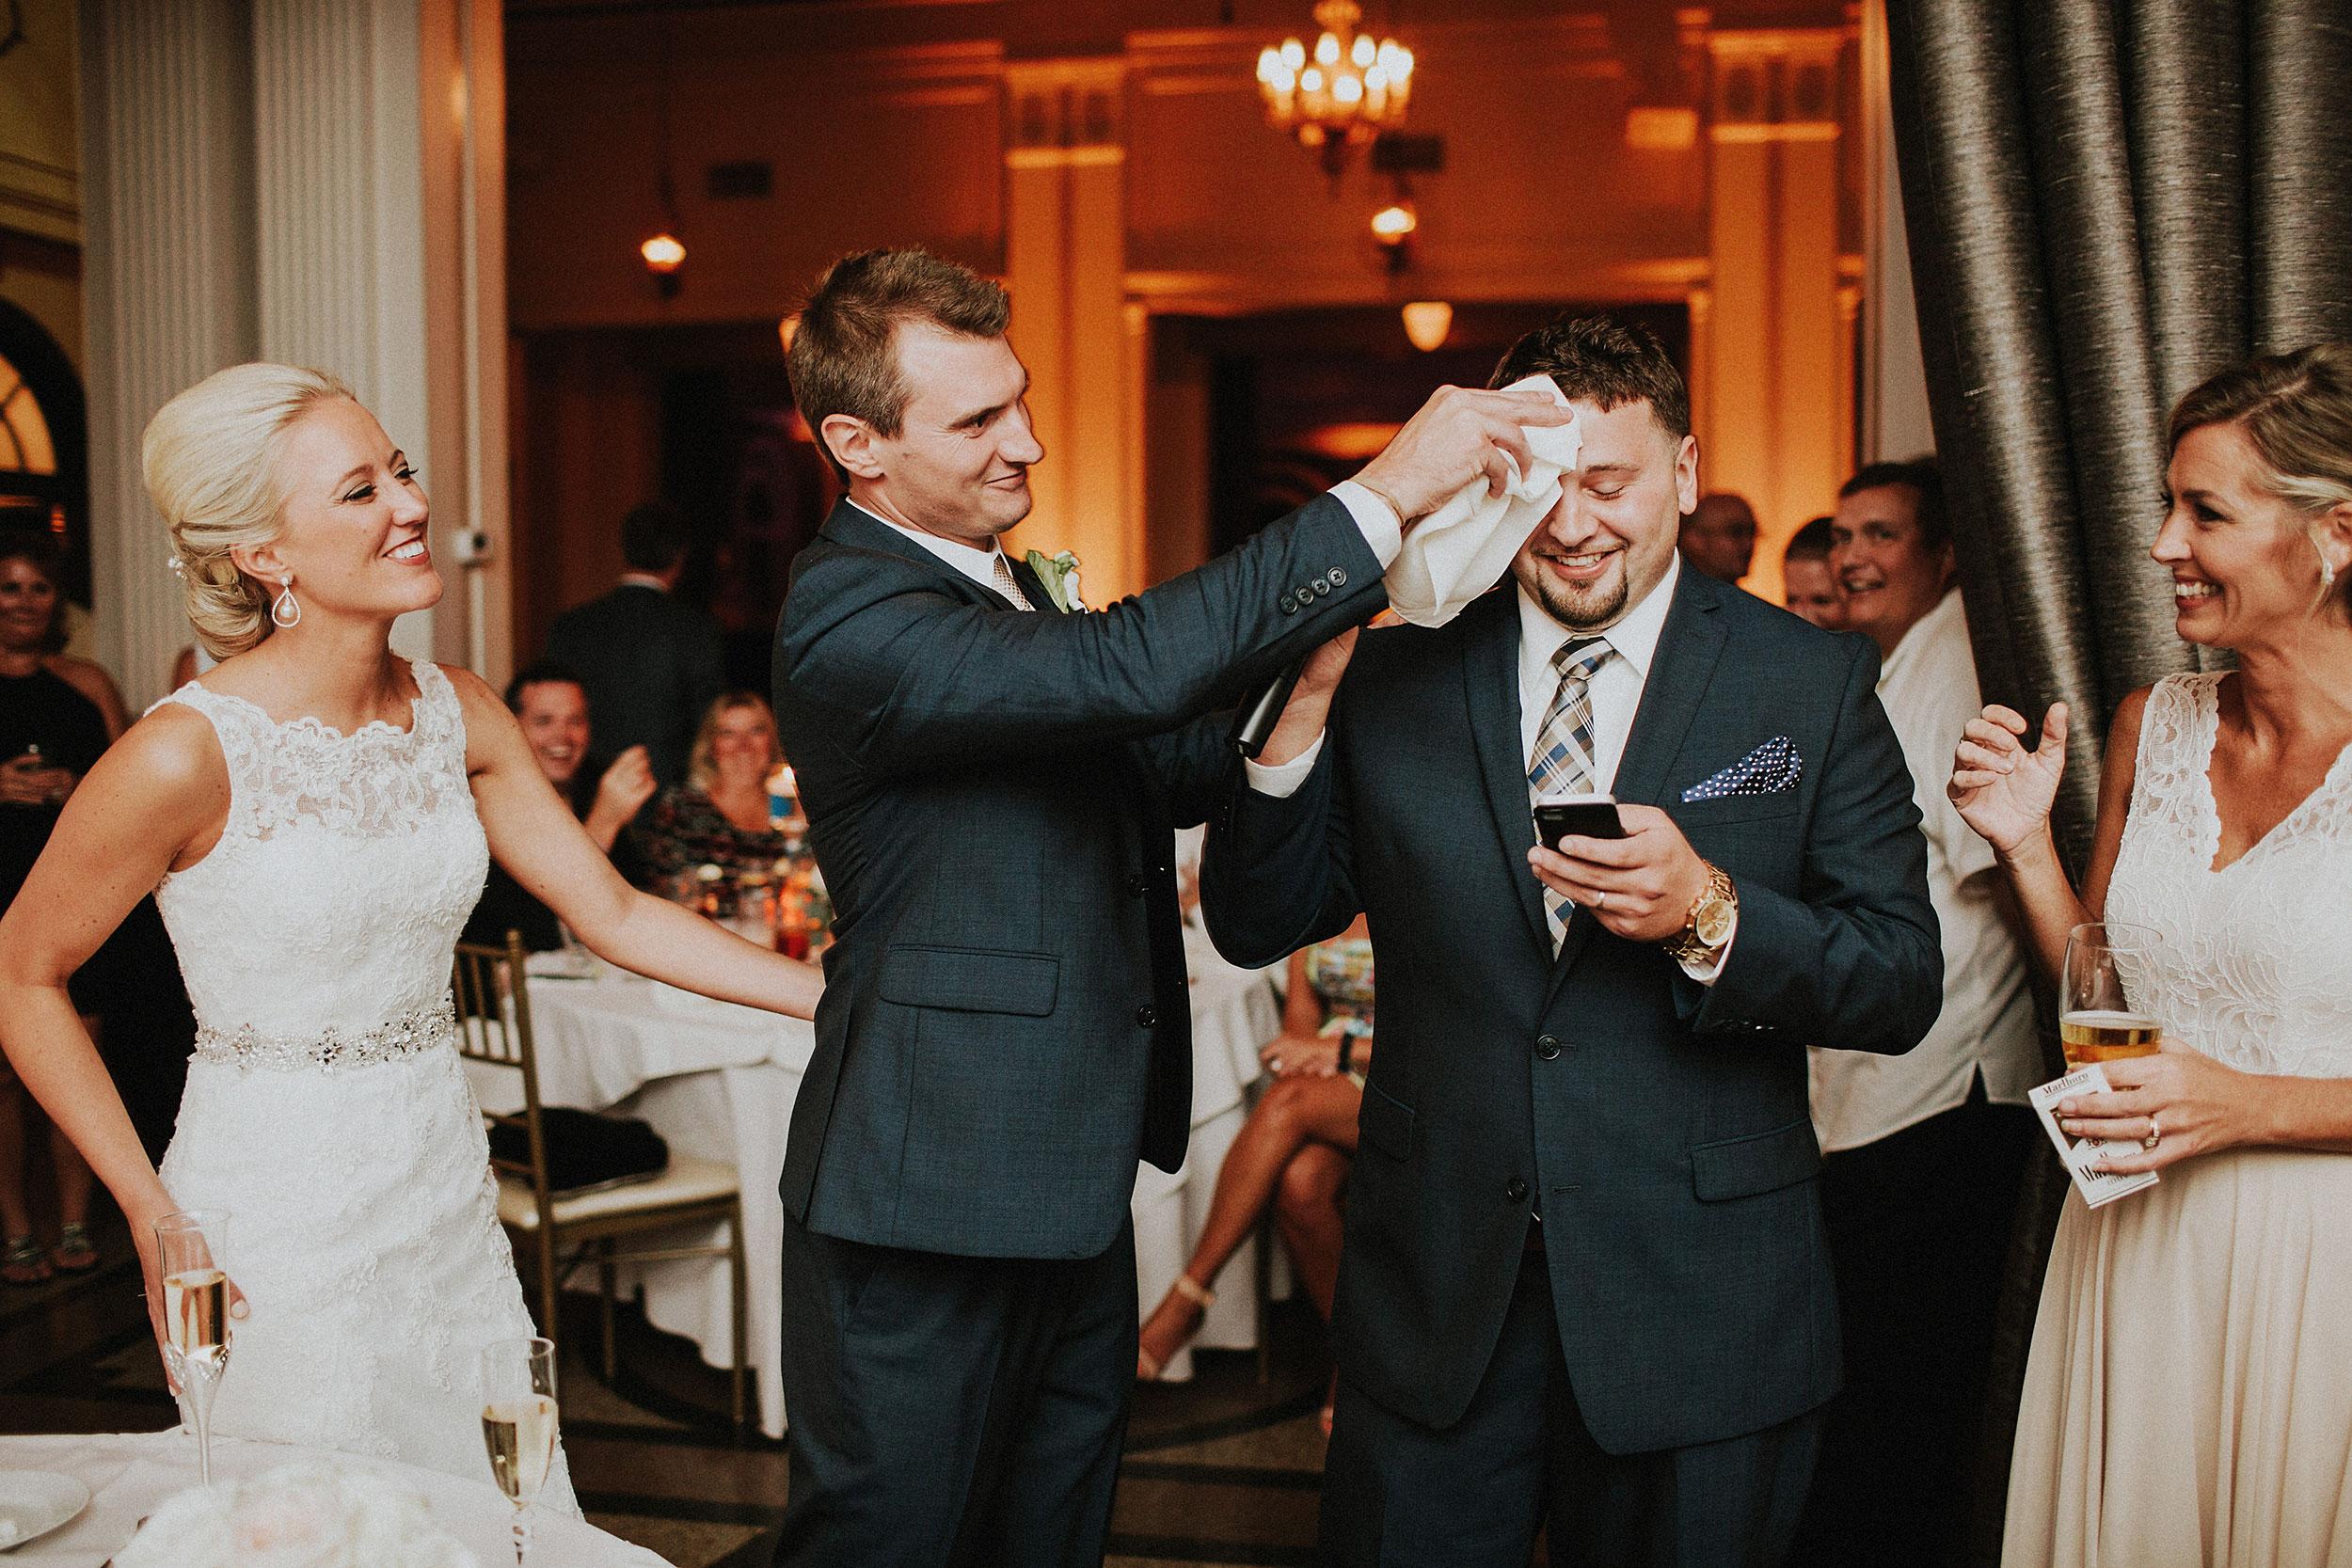 olmsted-wedding-louisville-kentucky-038.JPG